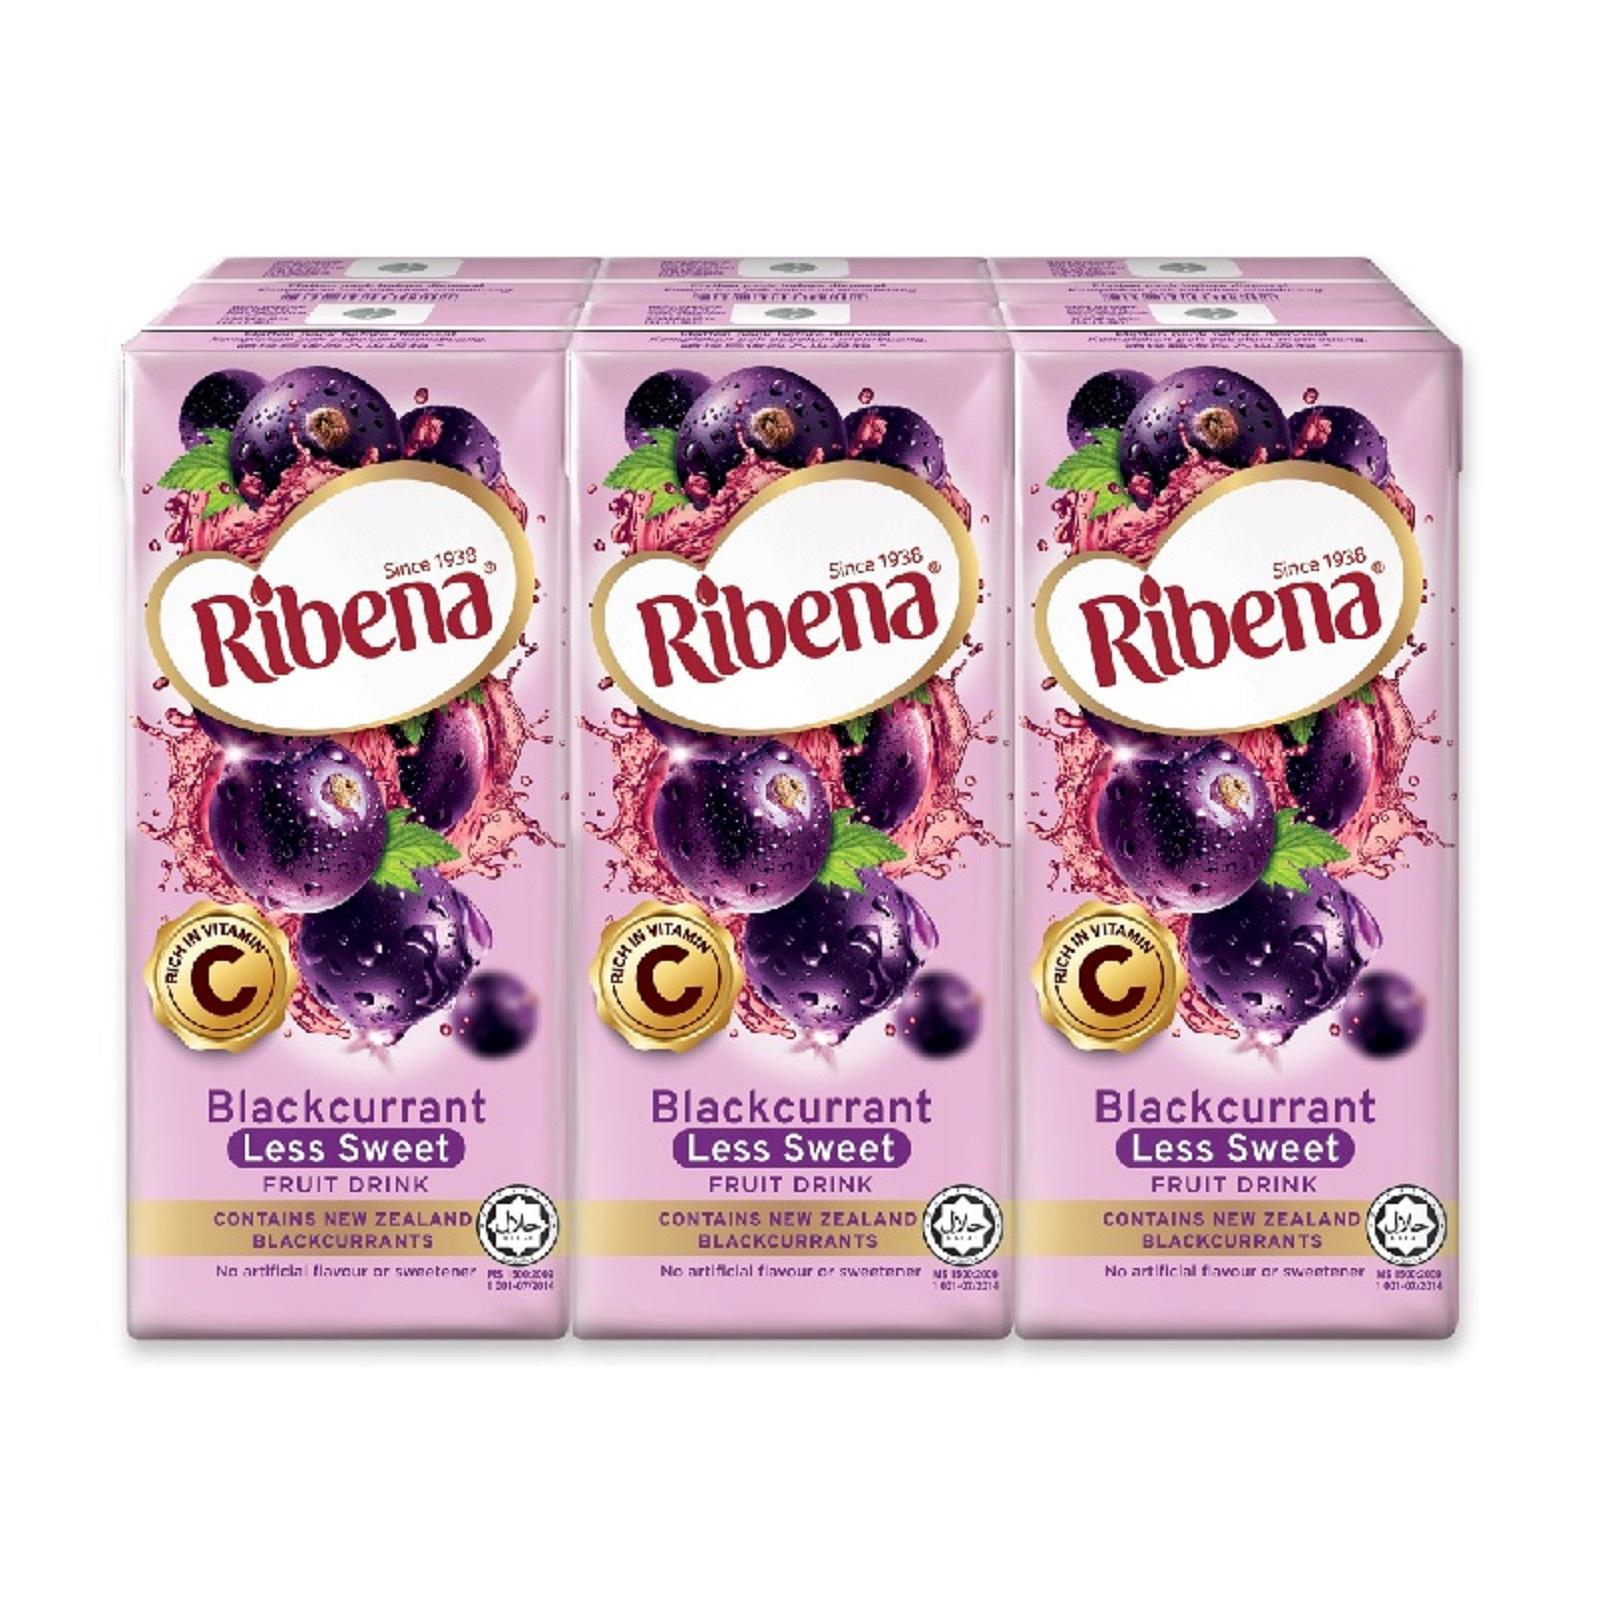 RIBENA Fruit Drink Blackcurrant Less Sweet 200ml x 6s